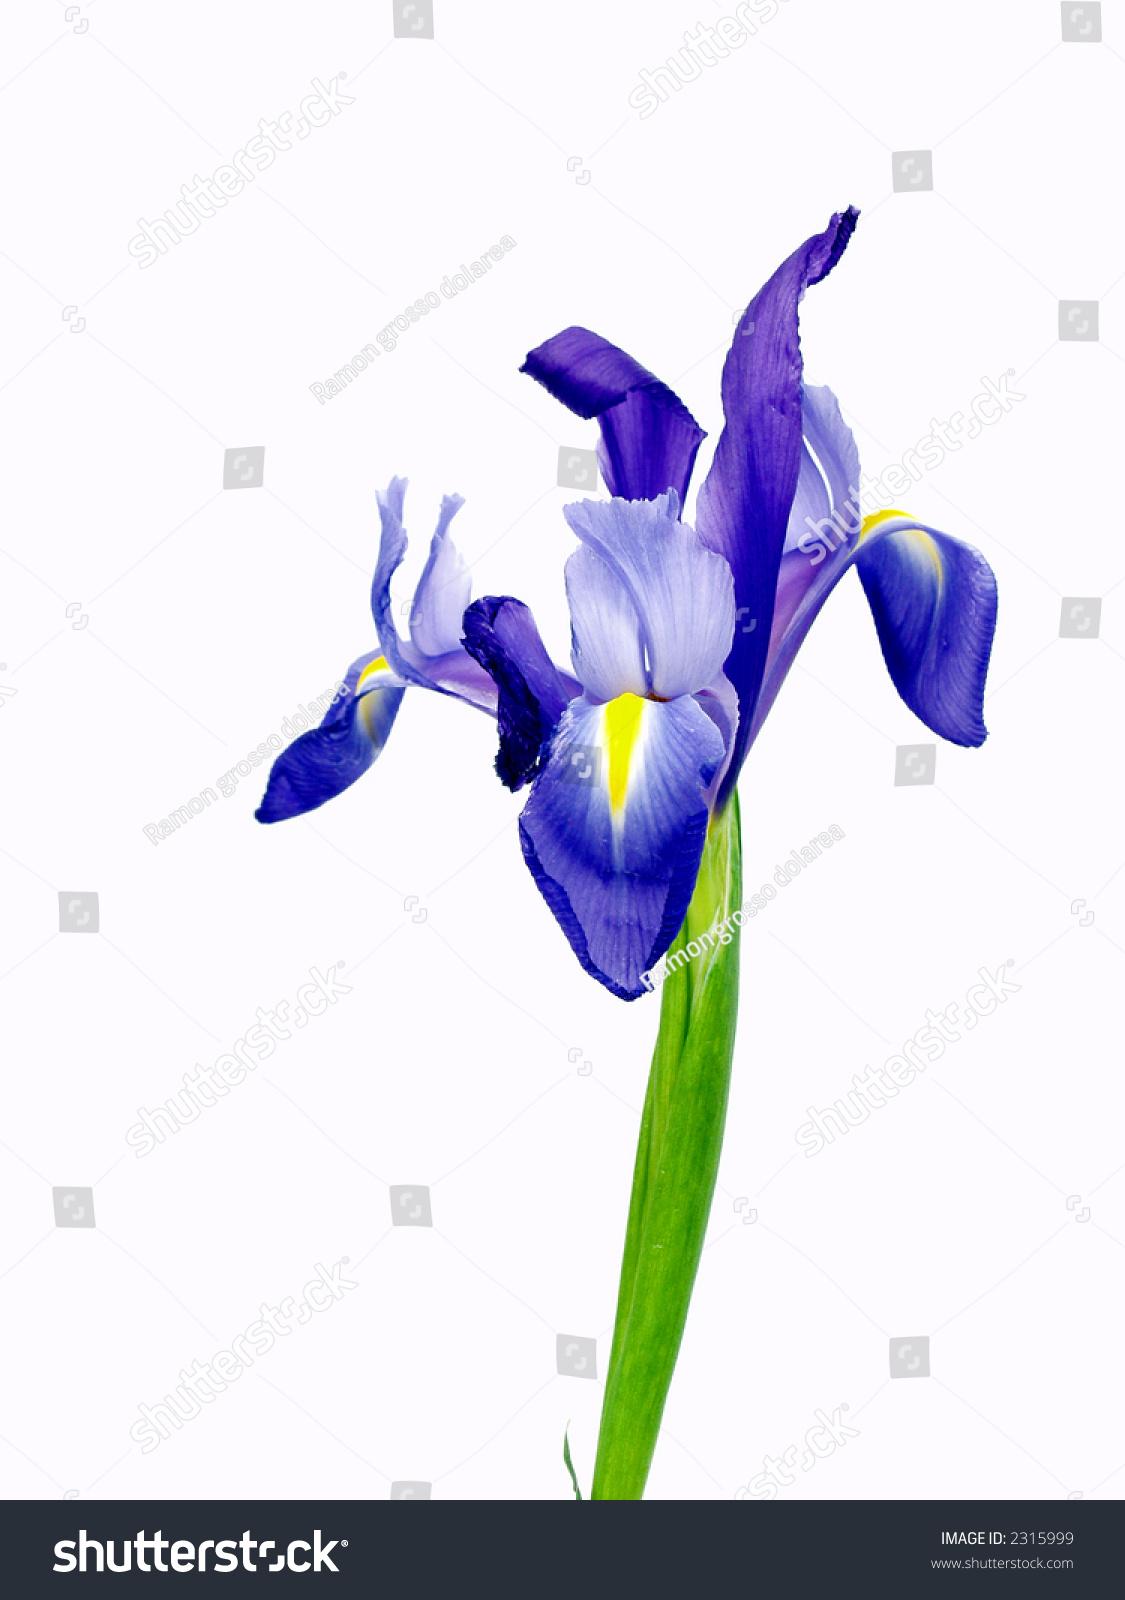 Blue Iris Flower Isolated On White Backgrounds Ez Canvas